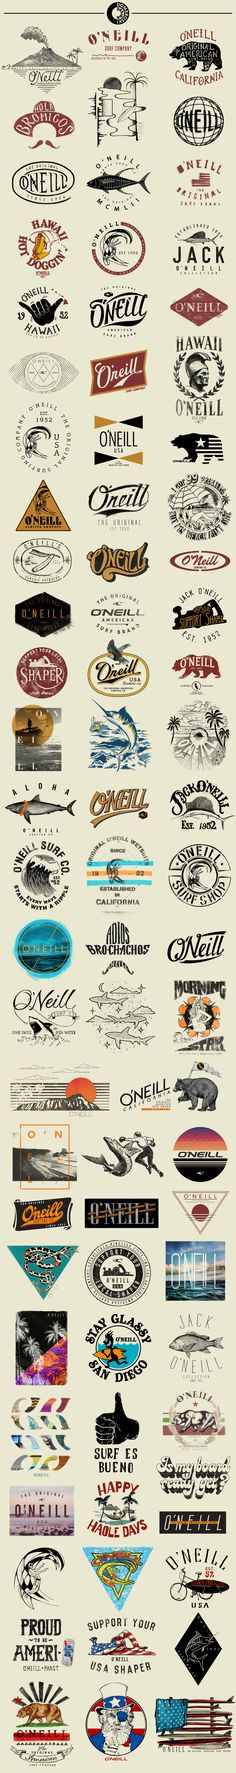 462 best Graphic Design images on Pinterest Brand design - resume indesign template